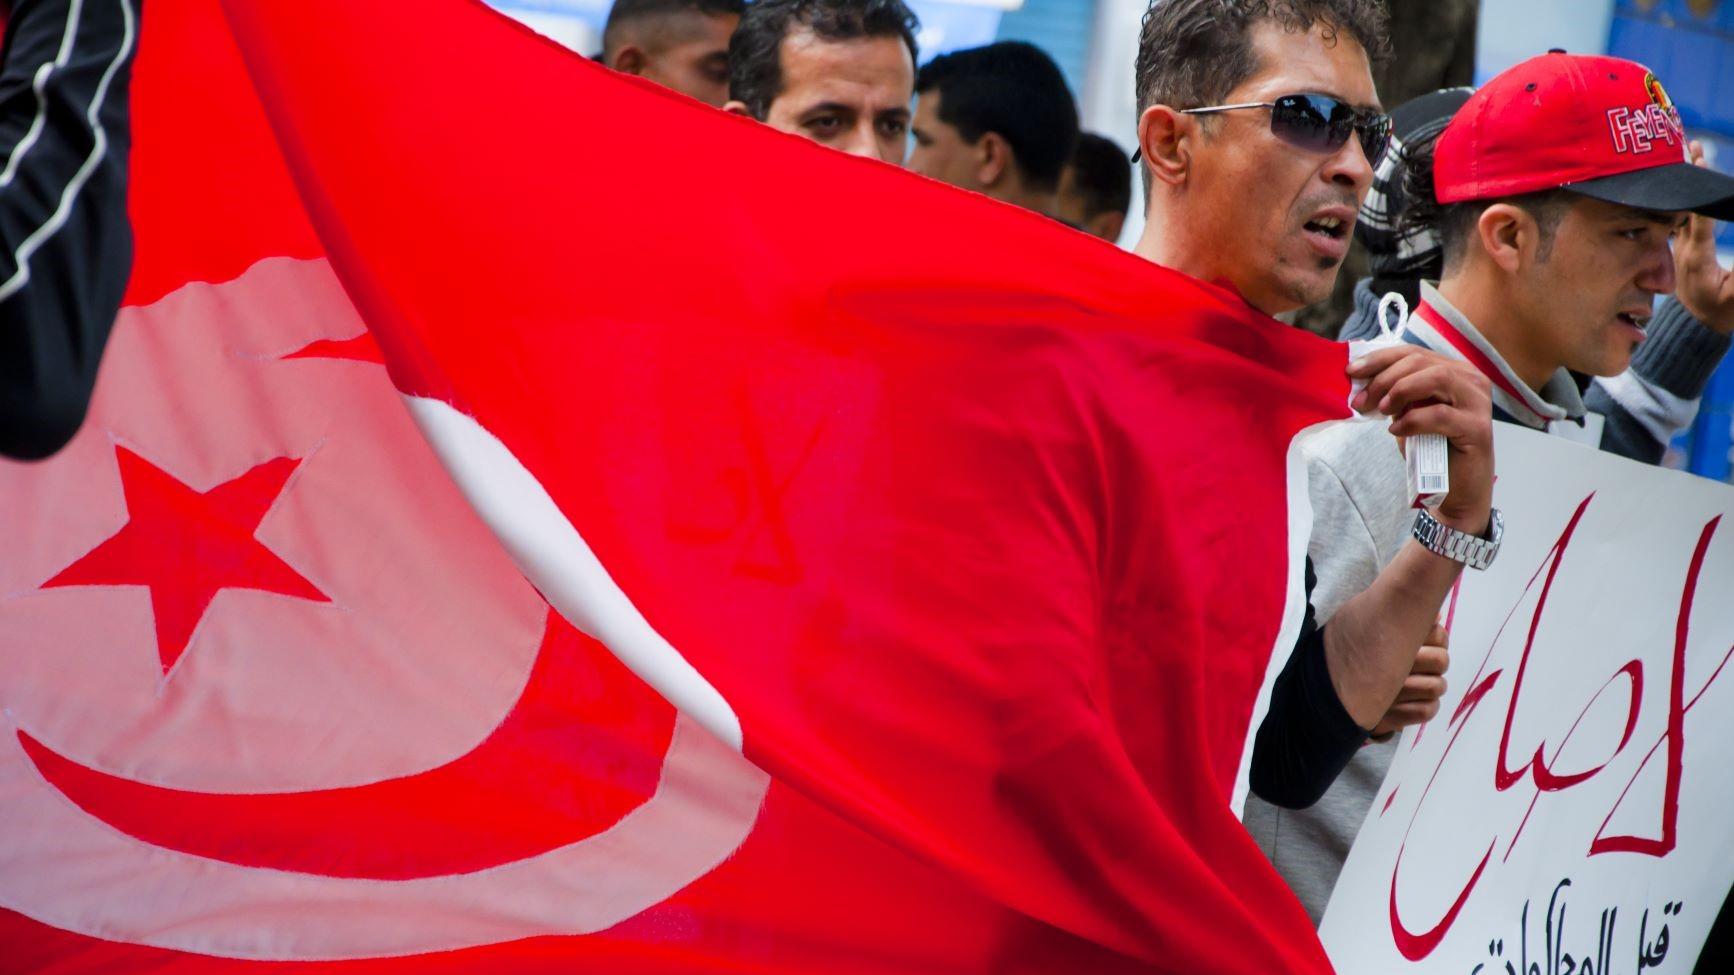 Tunisia democracy fails again